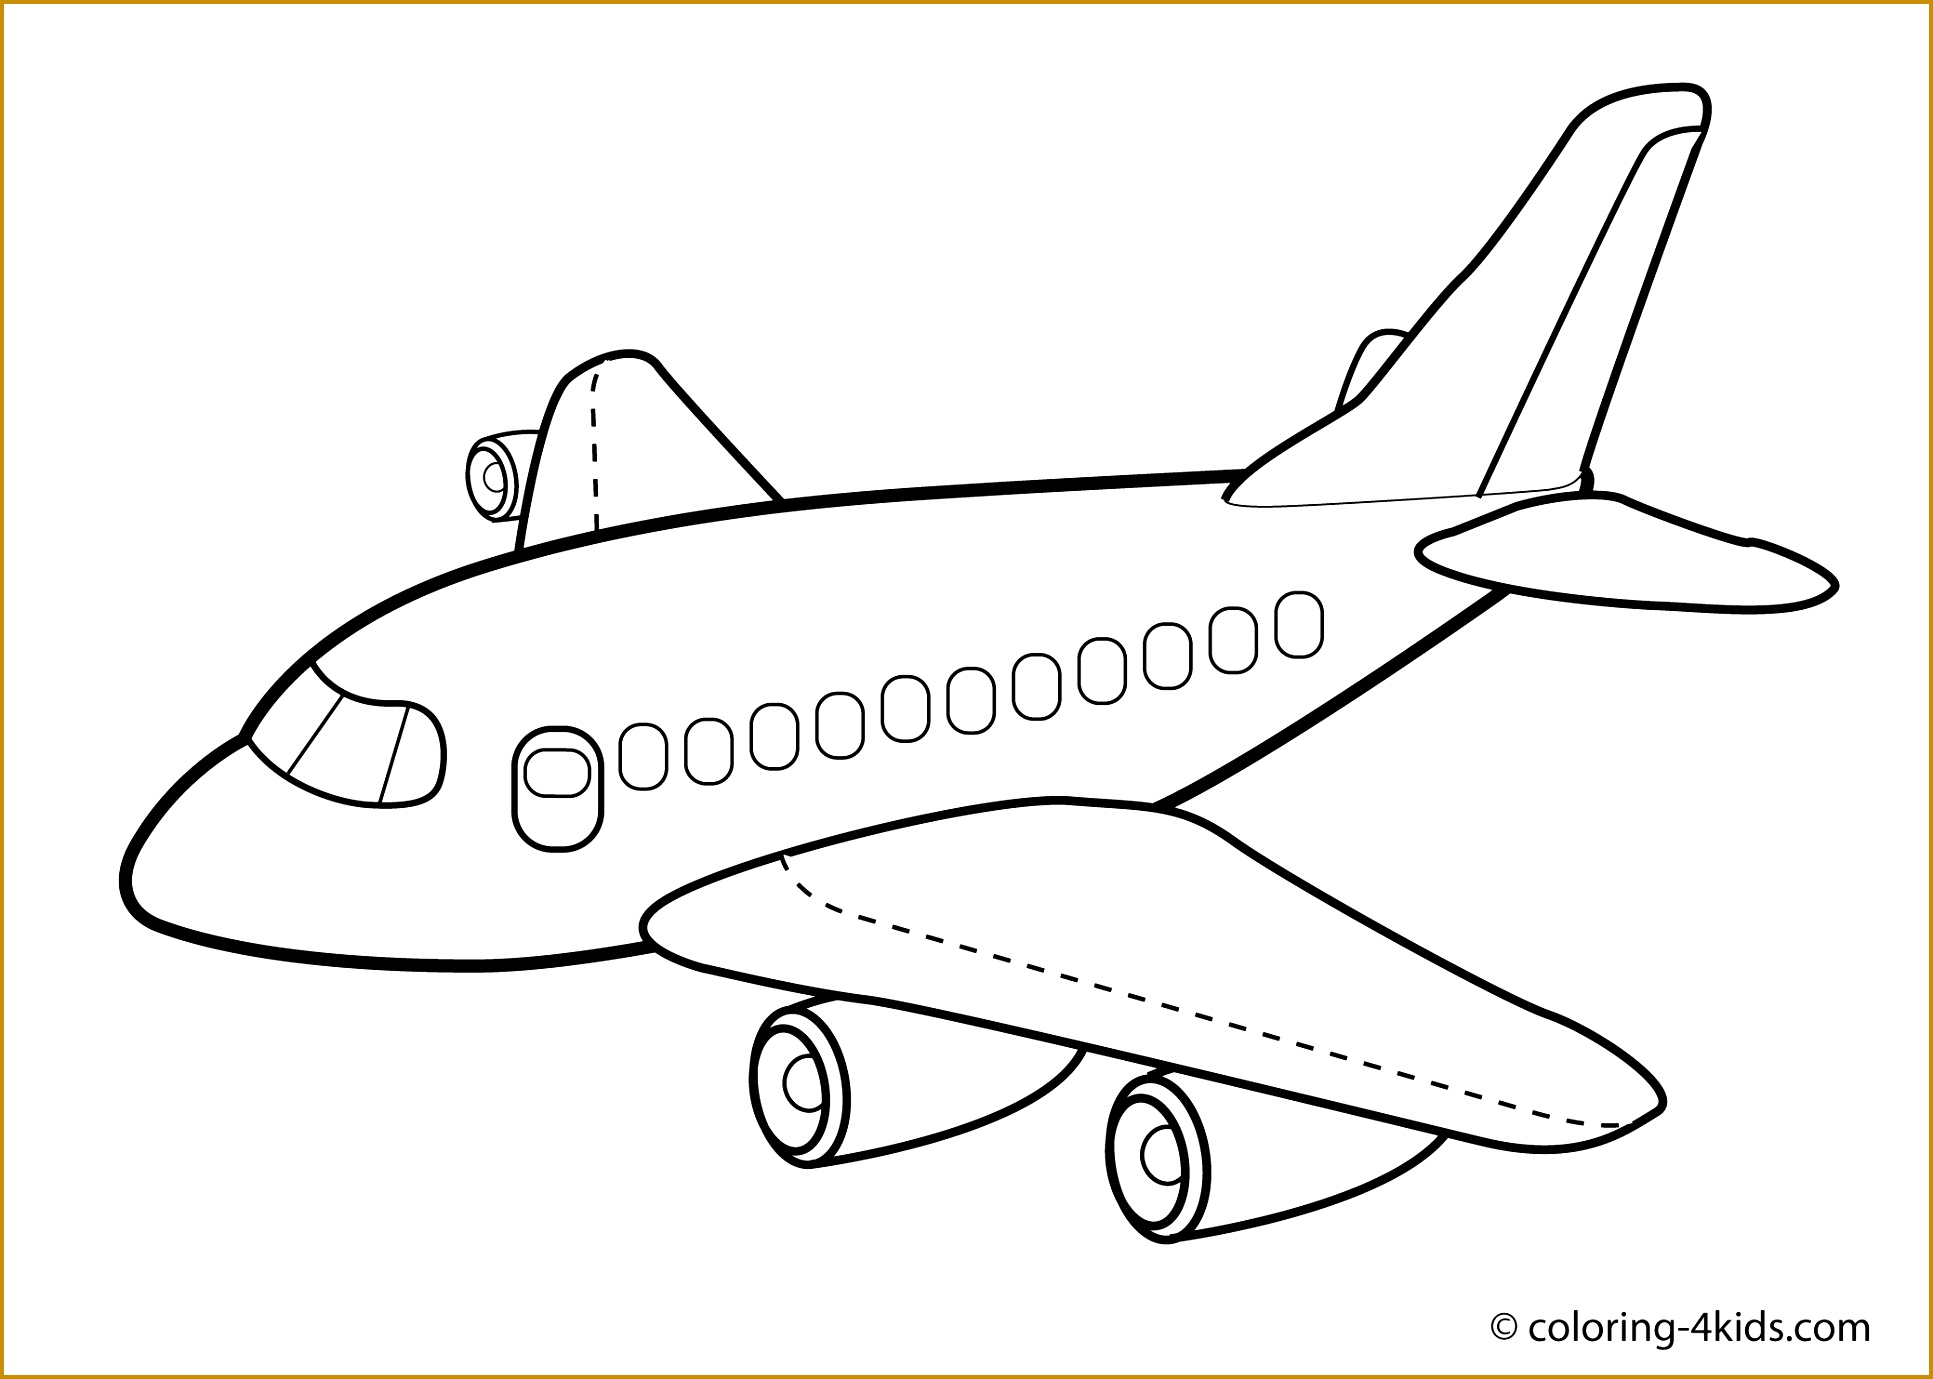 Paper Airplane Drawing At Getdrawings